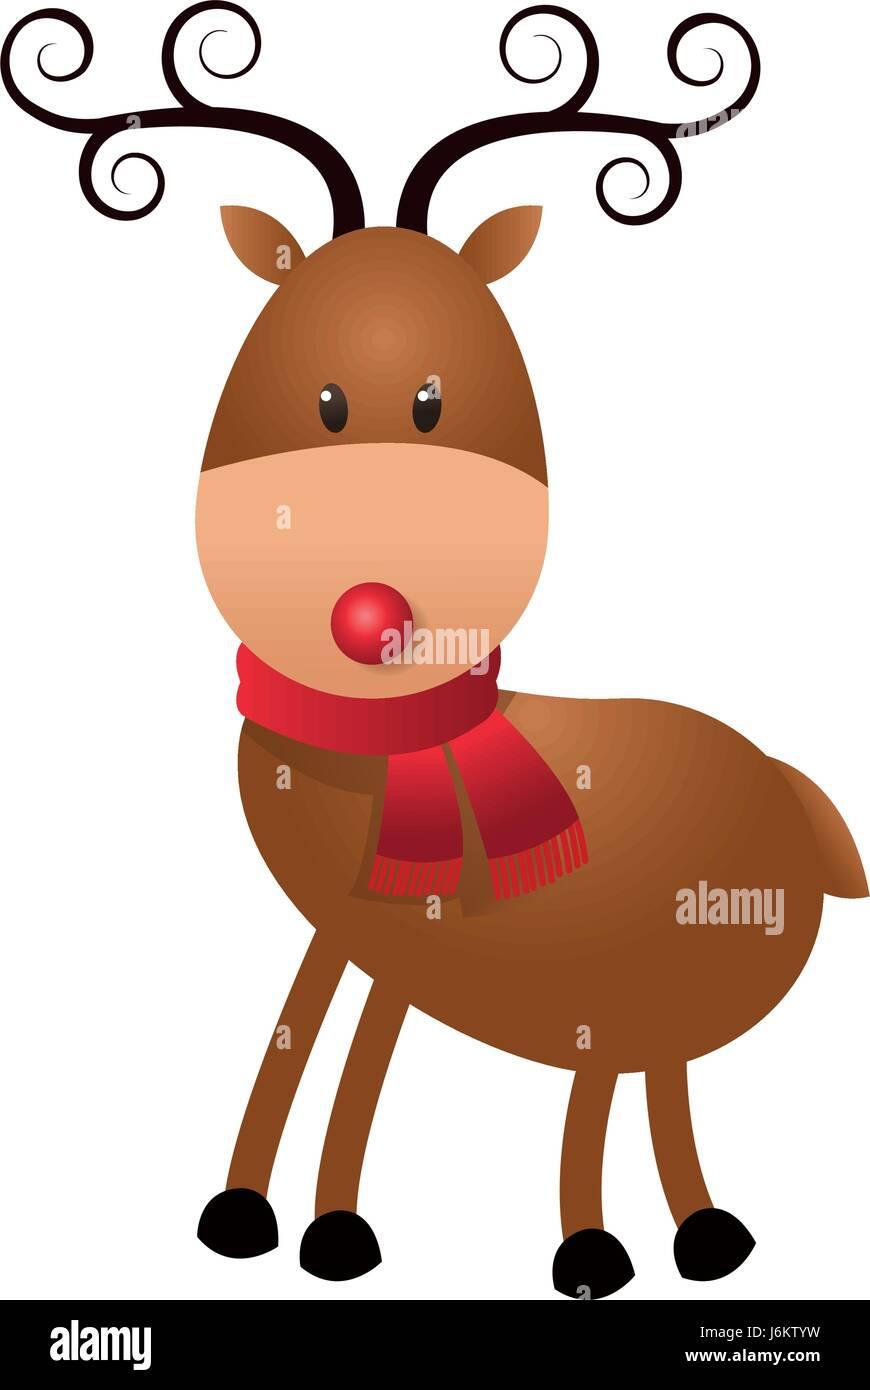 christmas cute reindeer scarf standing animal cartoon stock vector